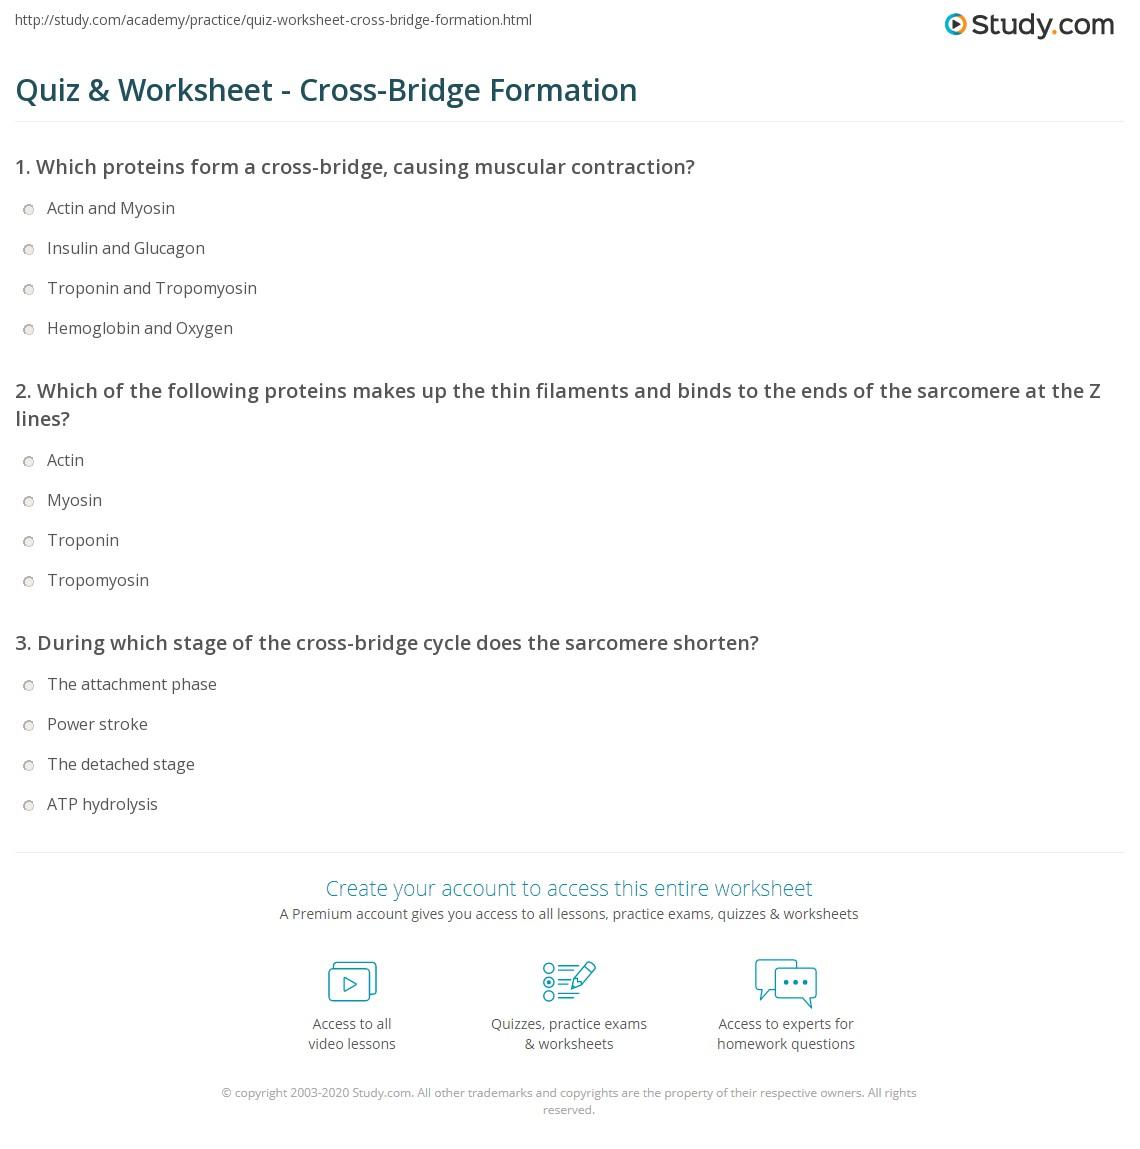 Worksheet Z Scores